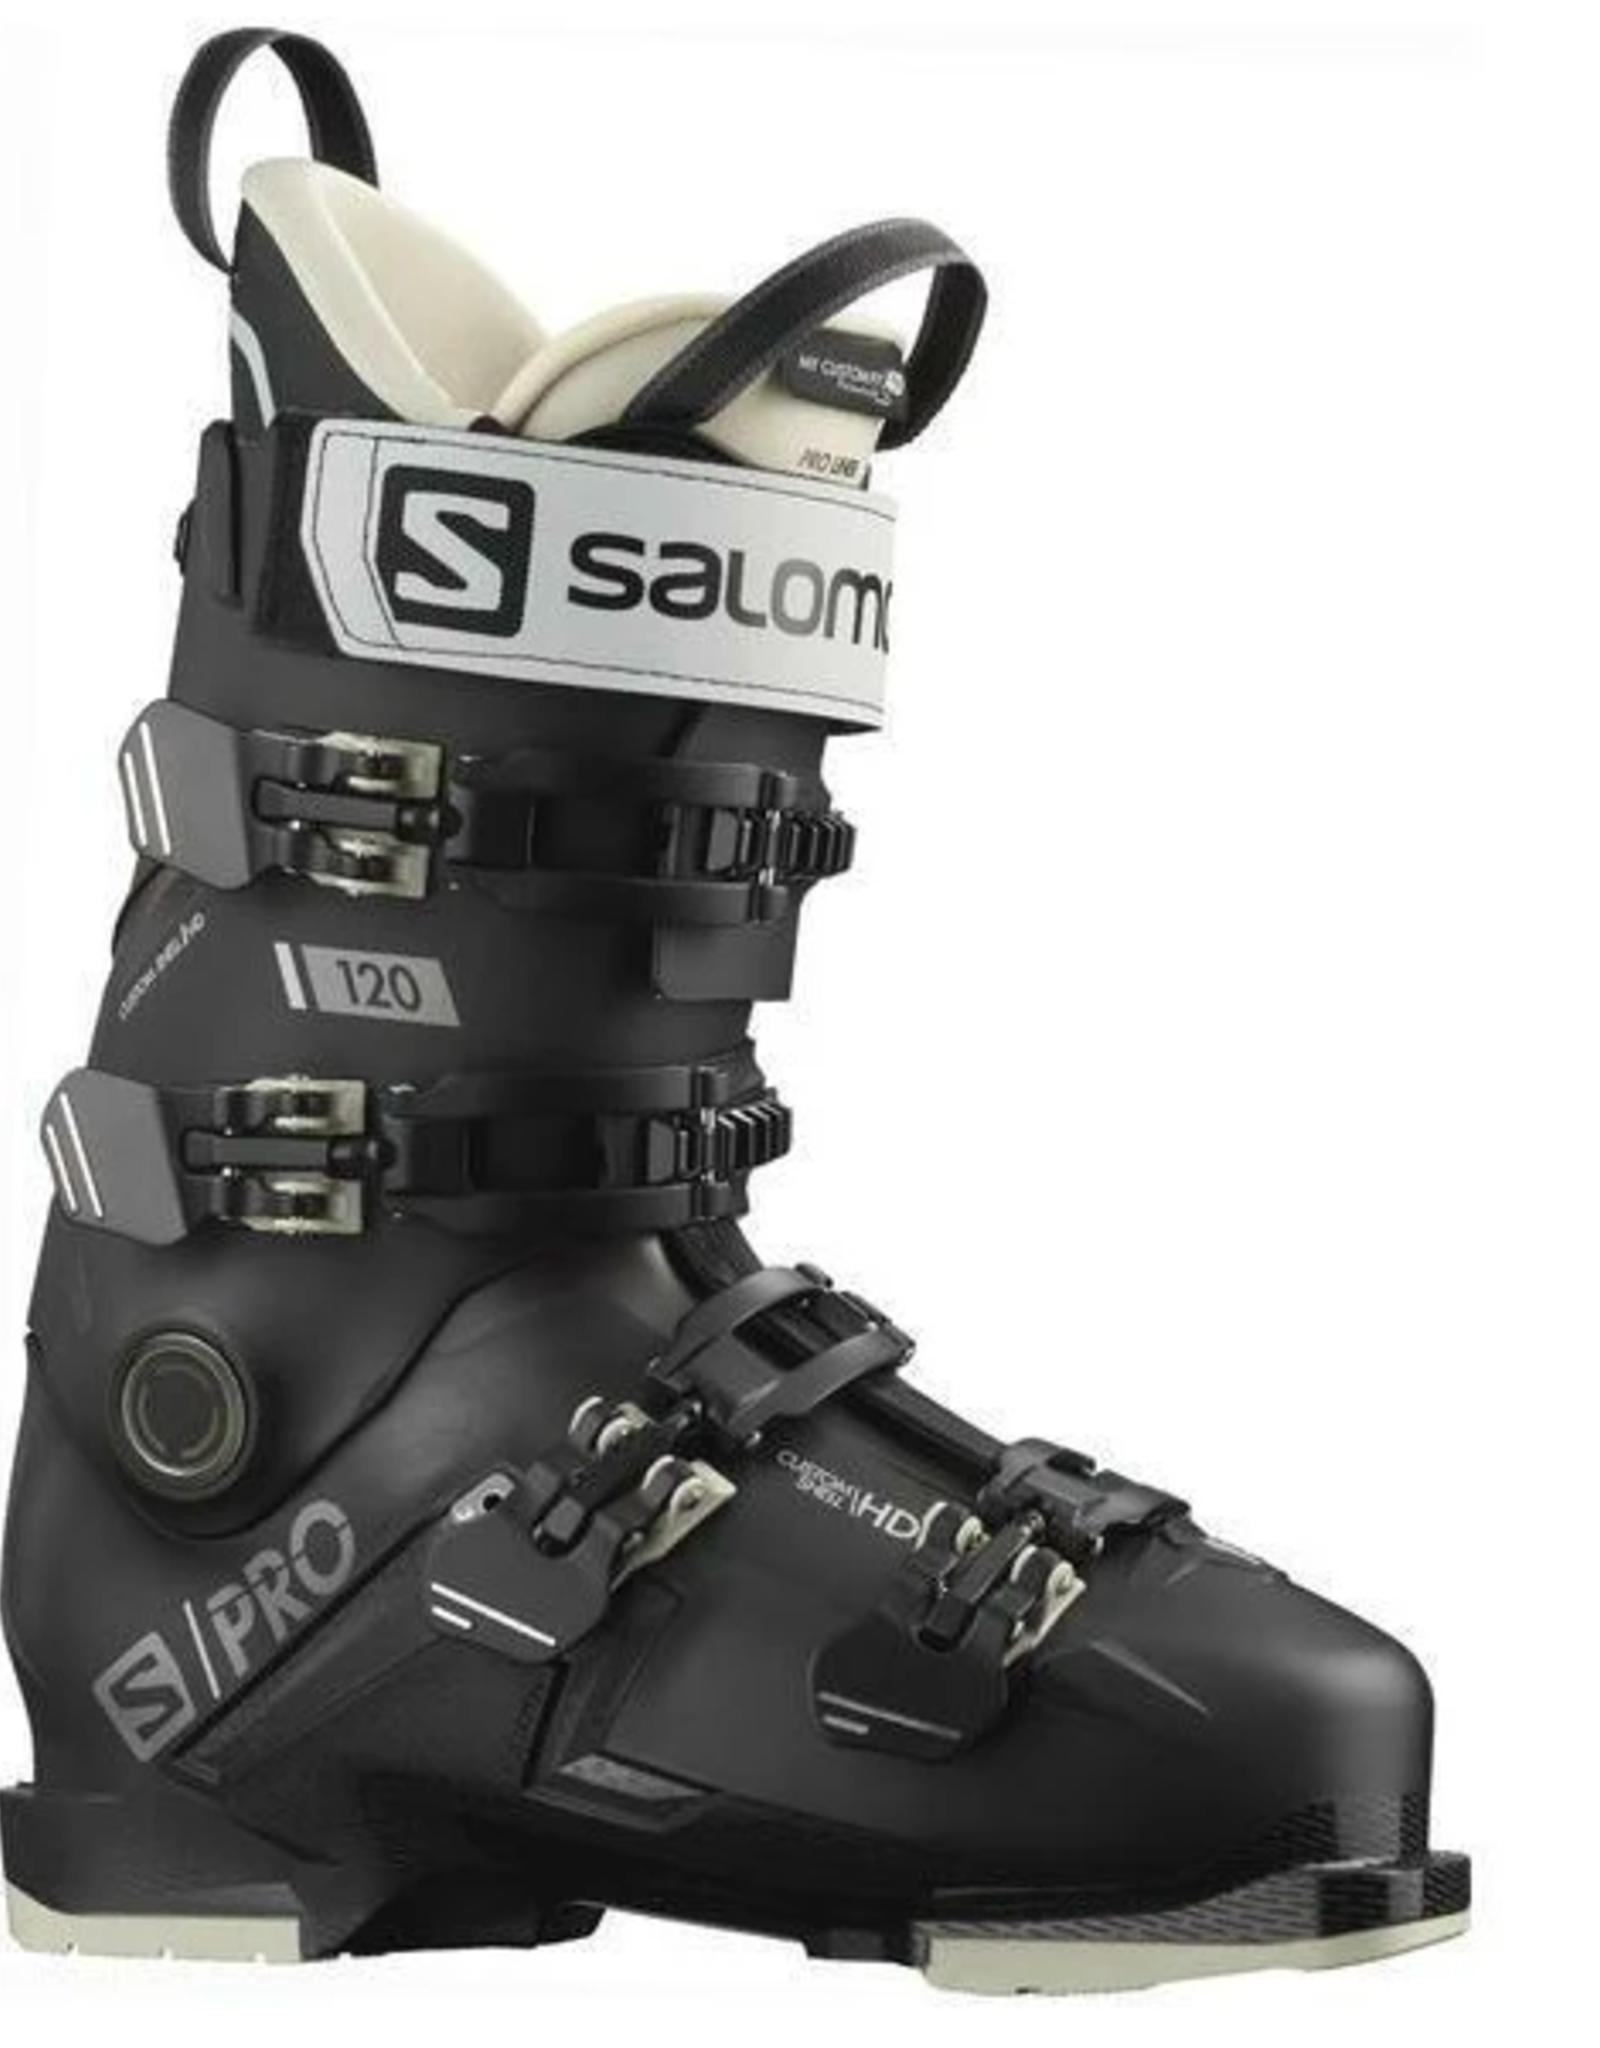 Salomon Men's Alp S/Pro 120 GW Ski Boots Black/Rainy Day 2022